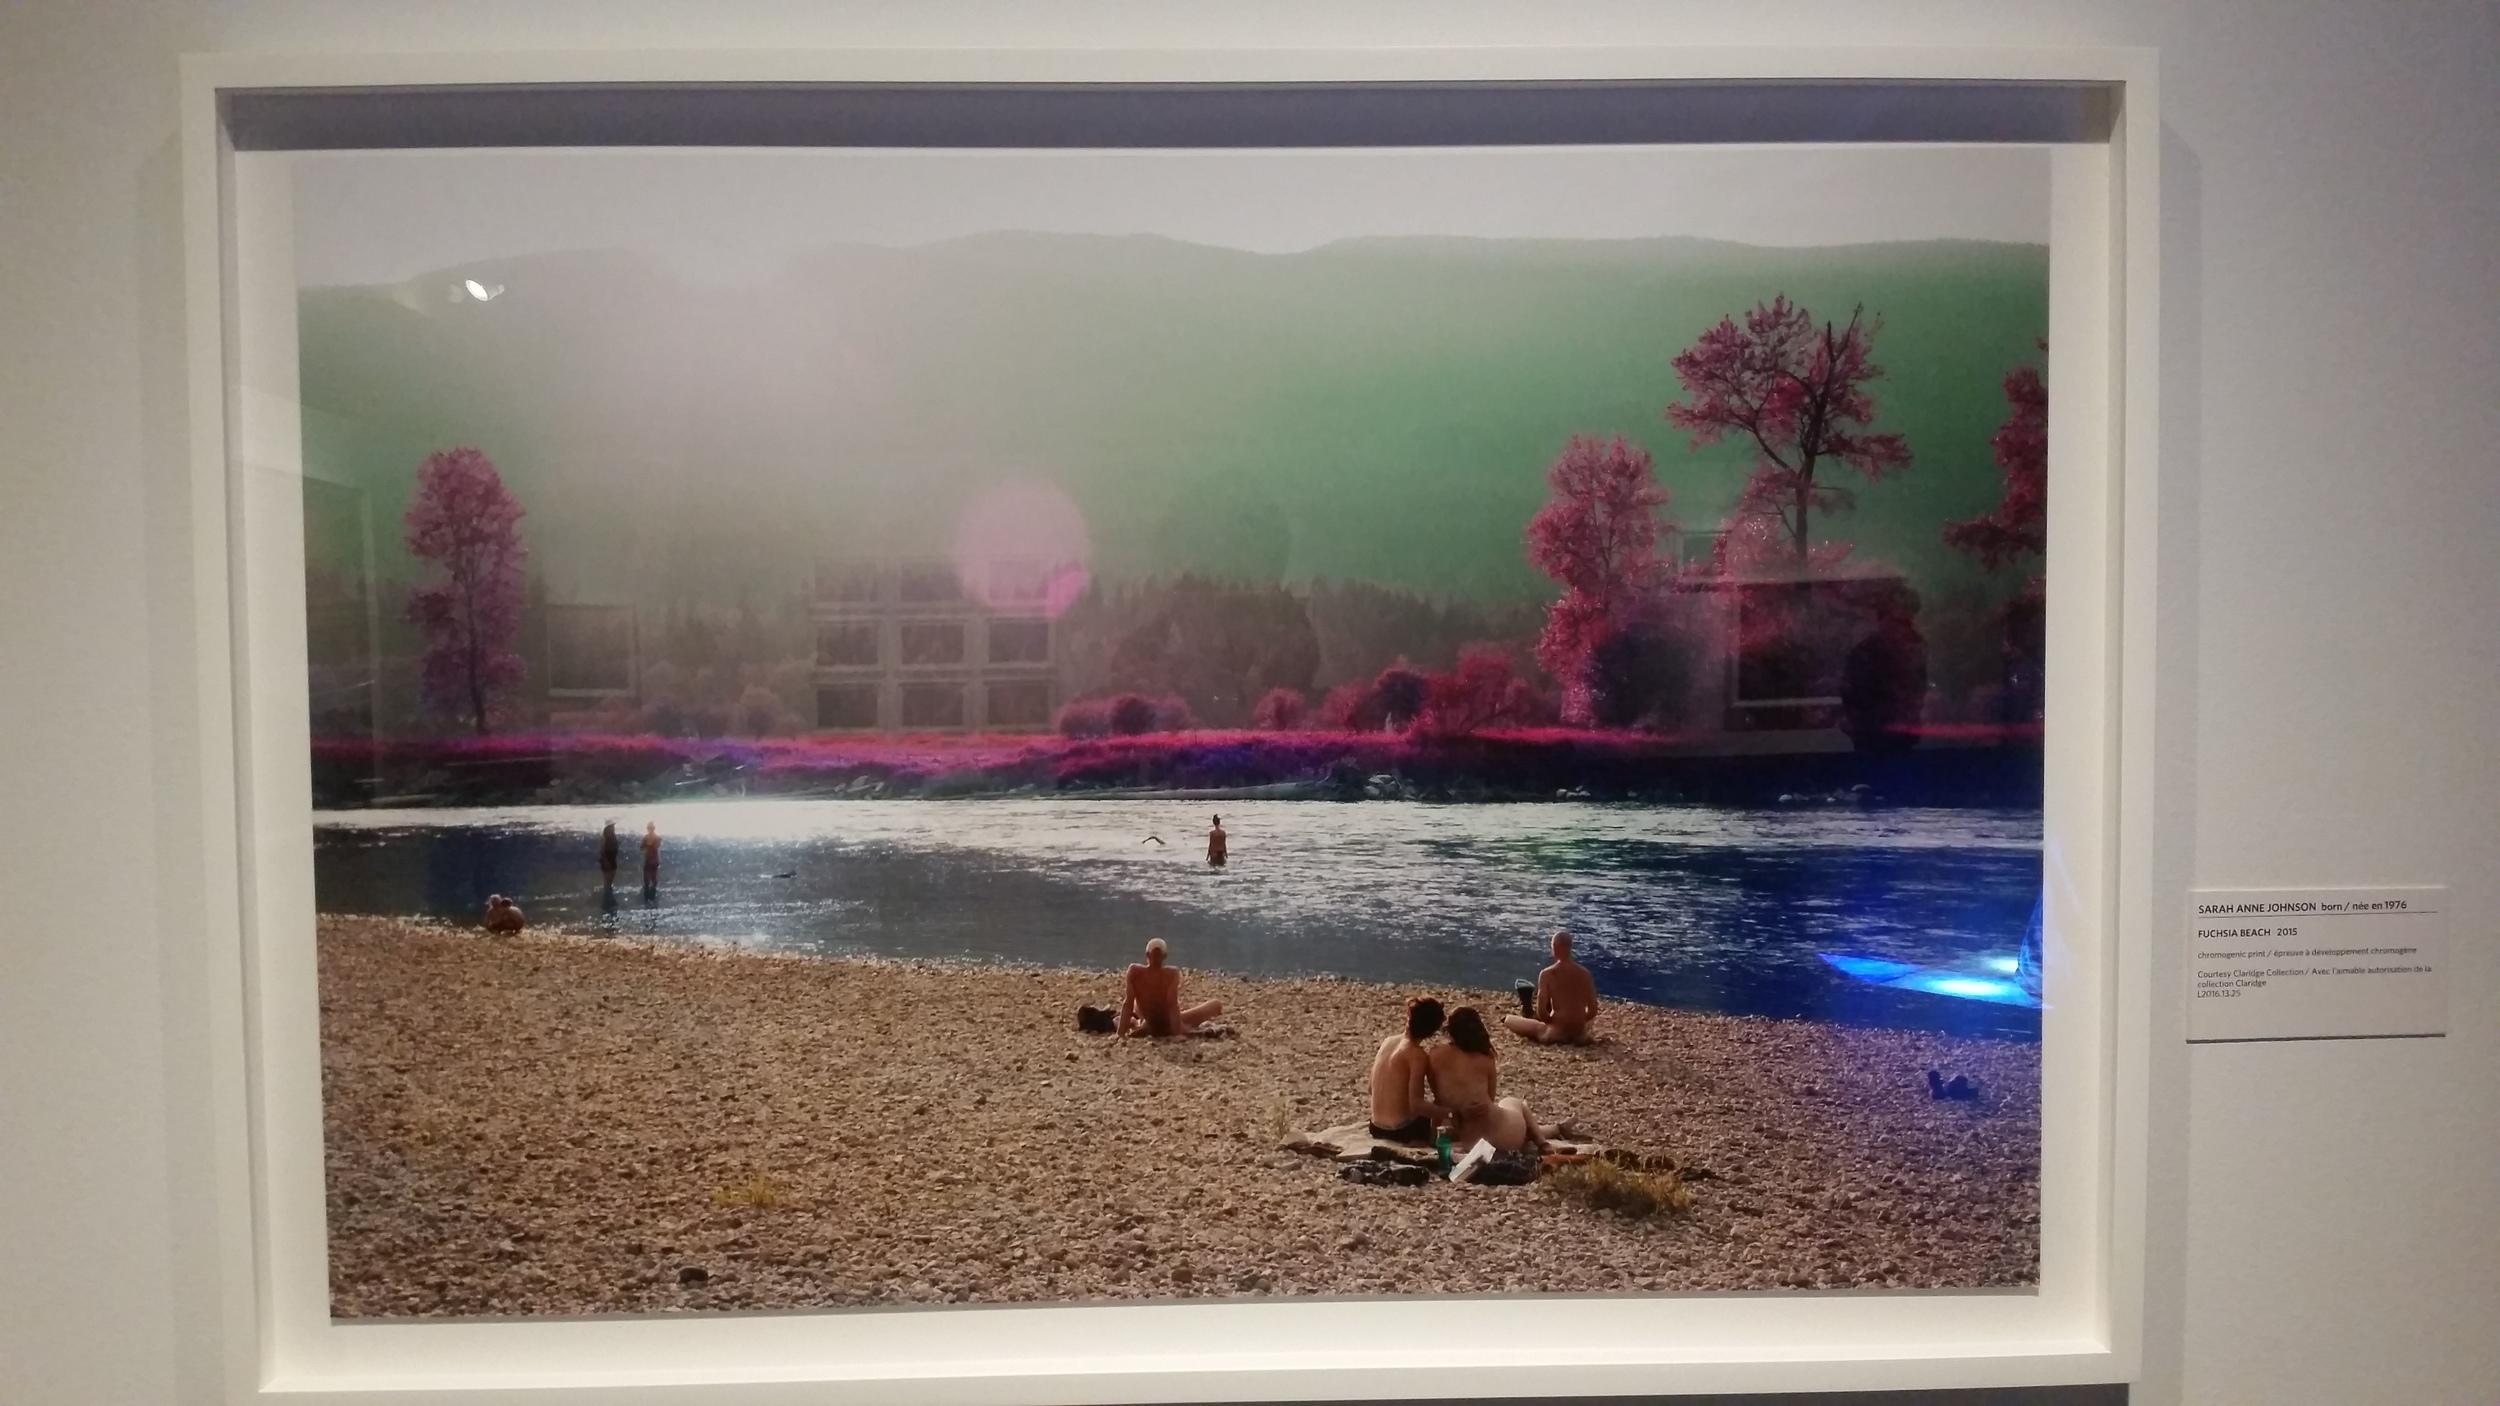 Fuchsia Beach by Sarah Anne Johnson. Chromogenic print.